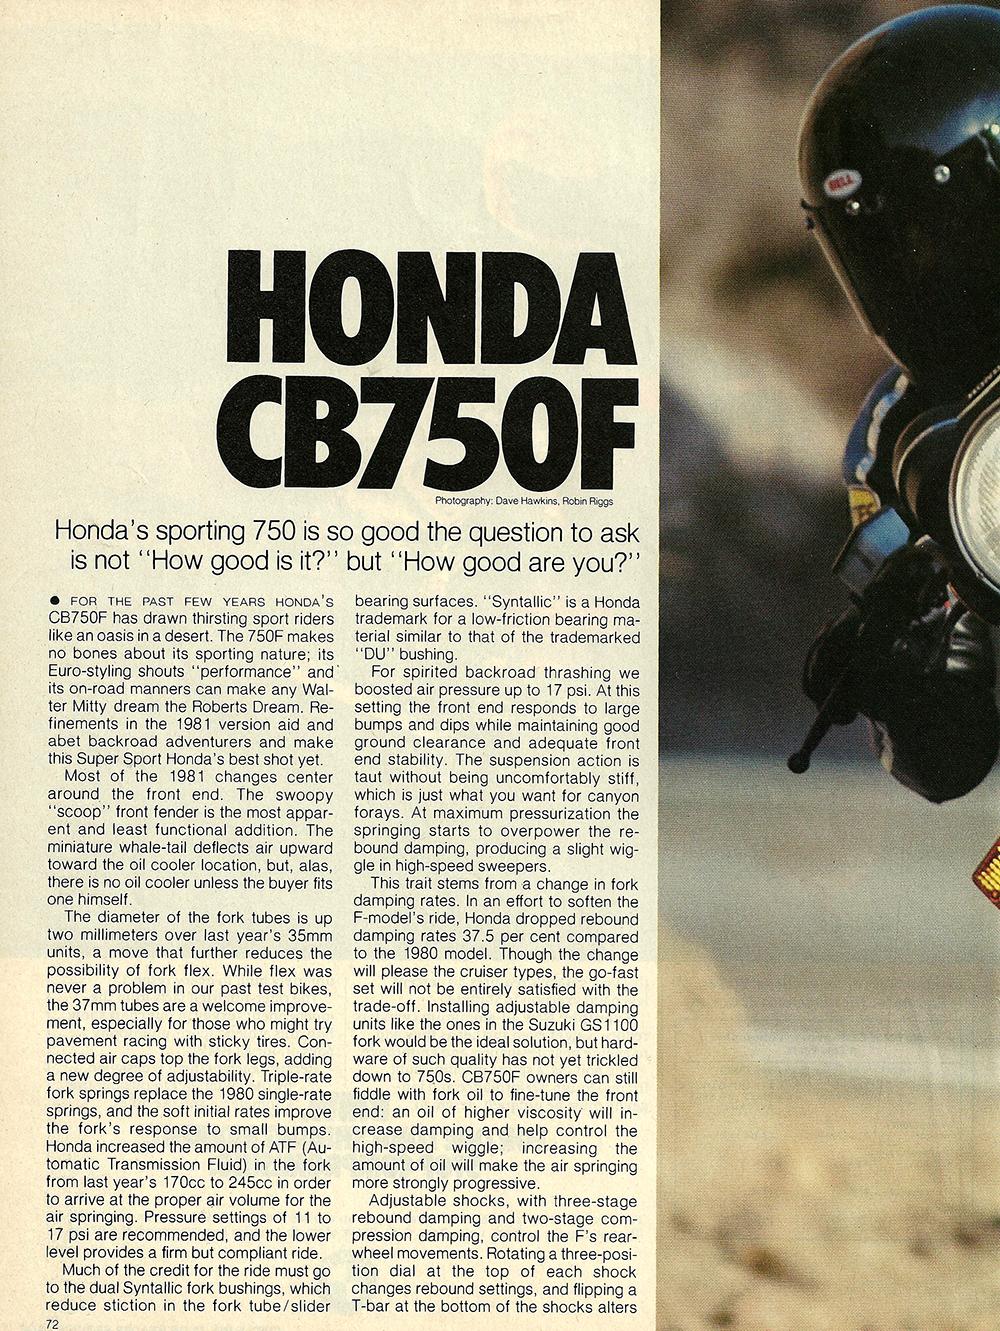 1980 Honda CB750F road test 01.jpg